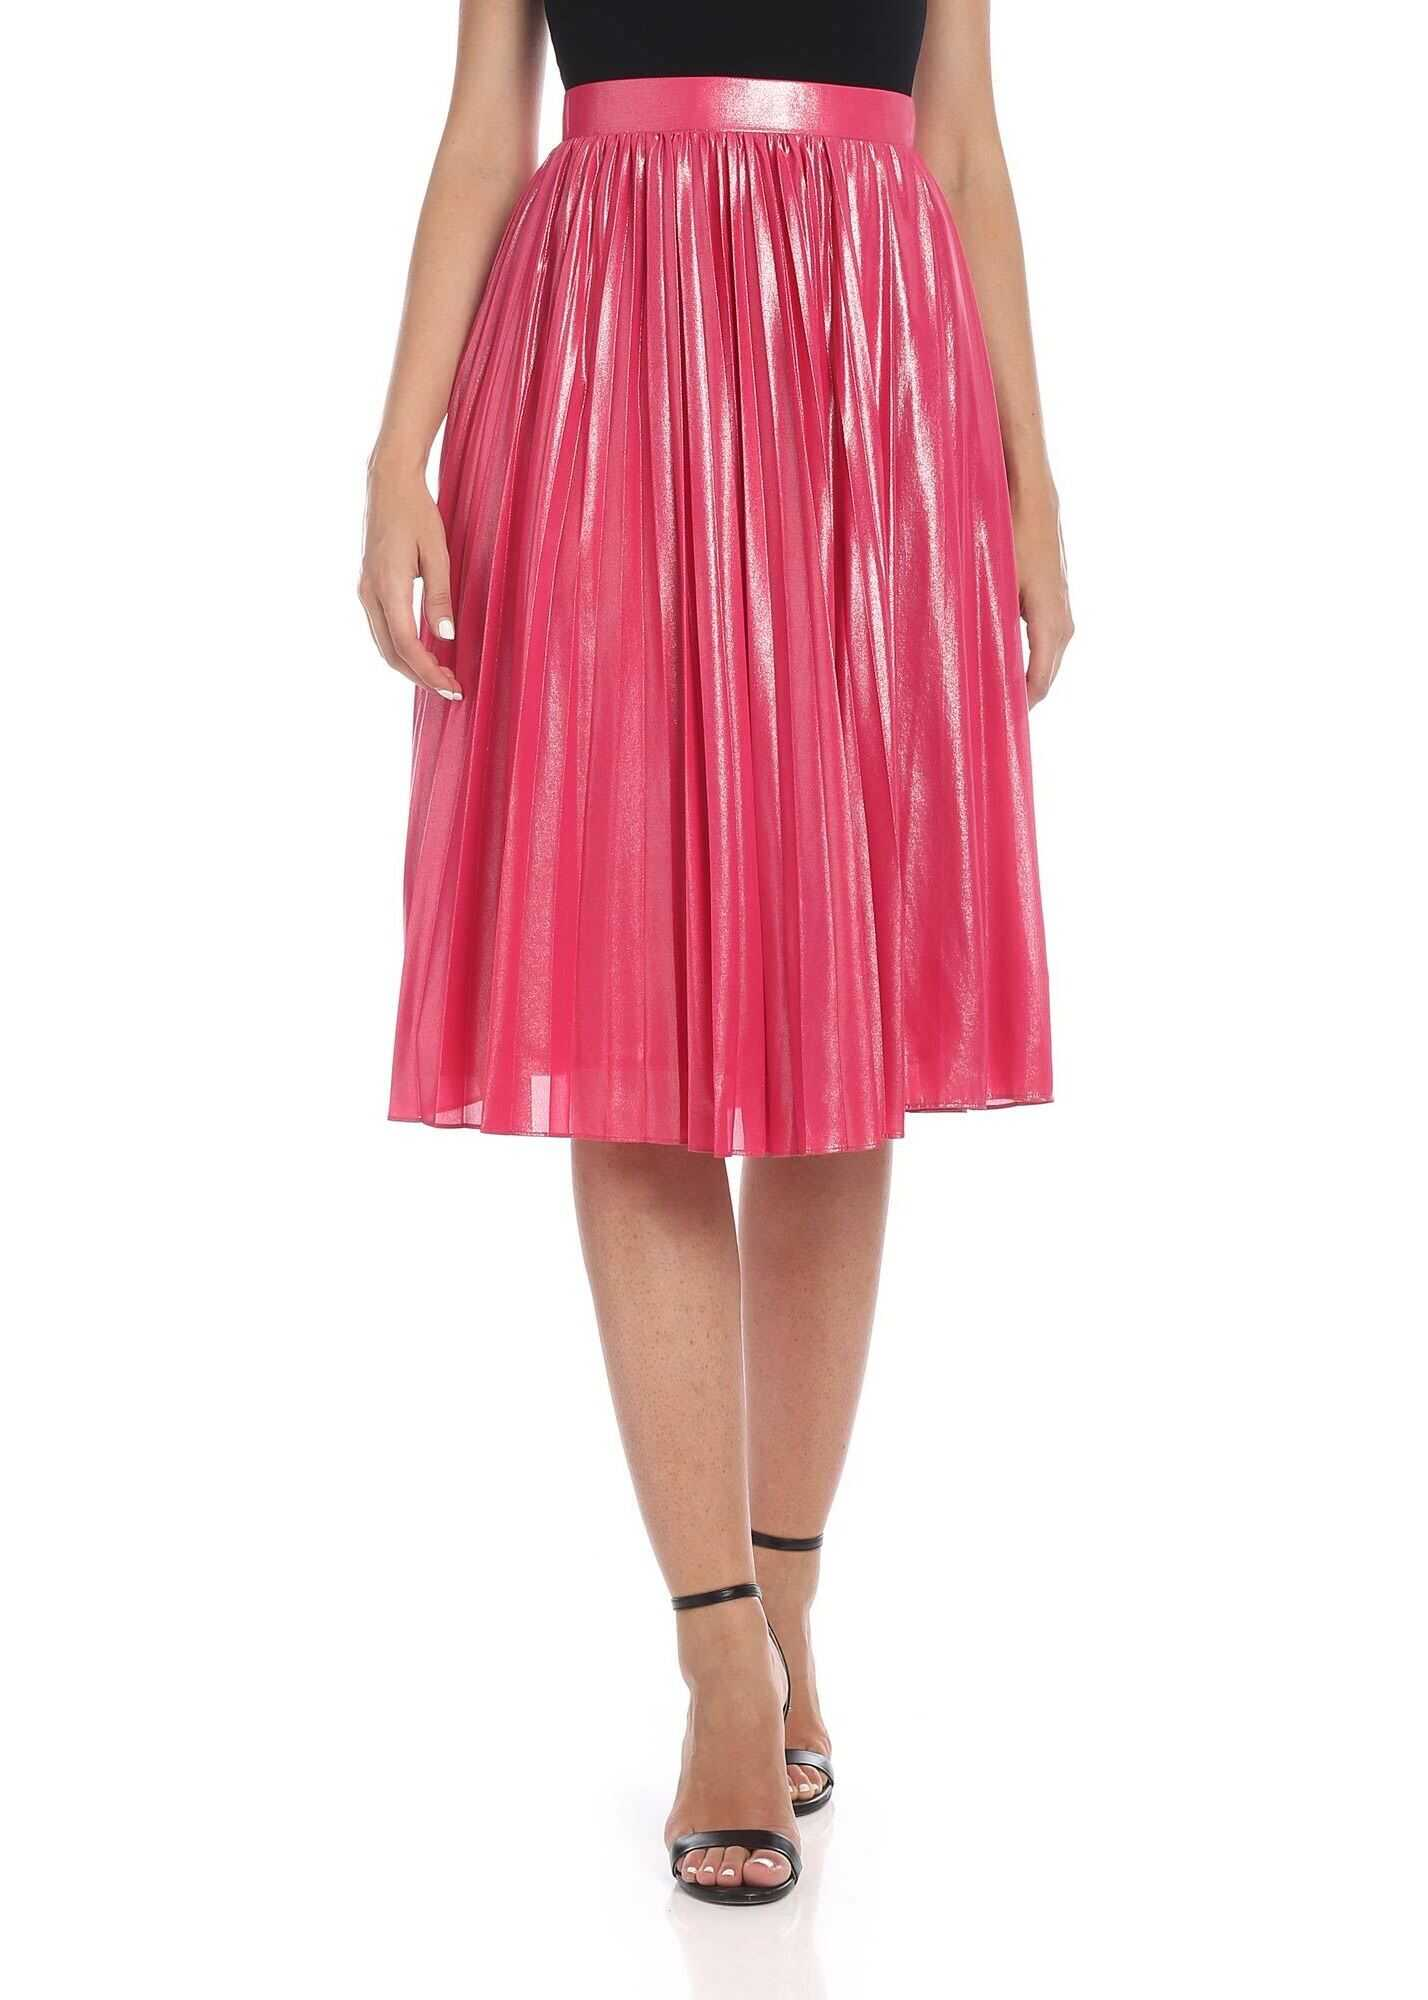 Pinko Obbedire Skirt In Laminated Fuchsia Fuchsia